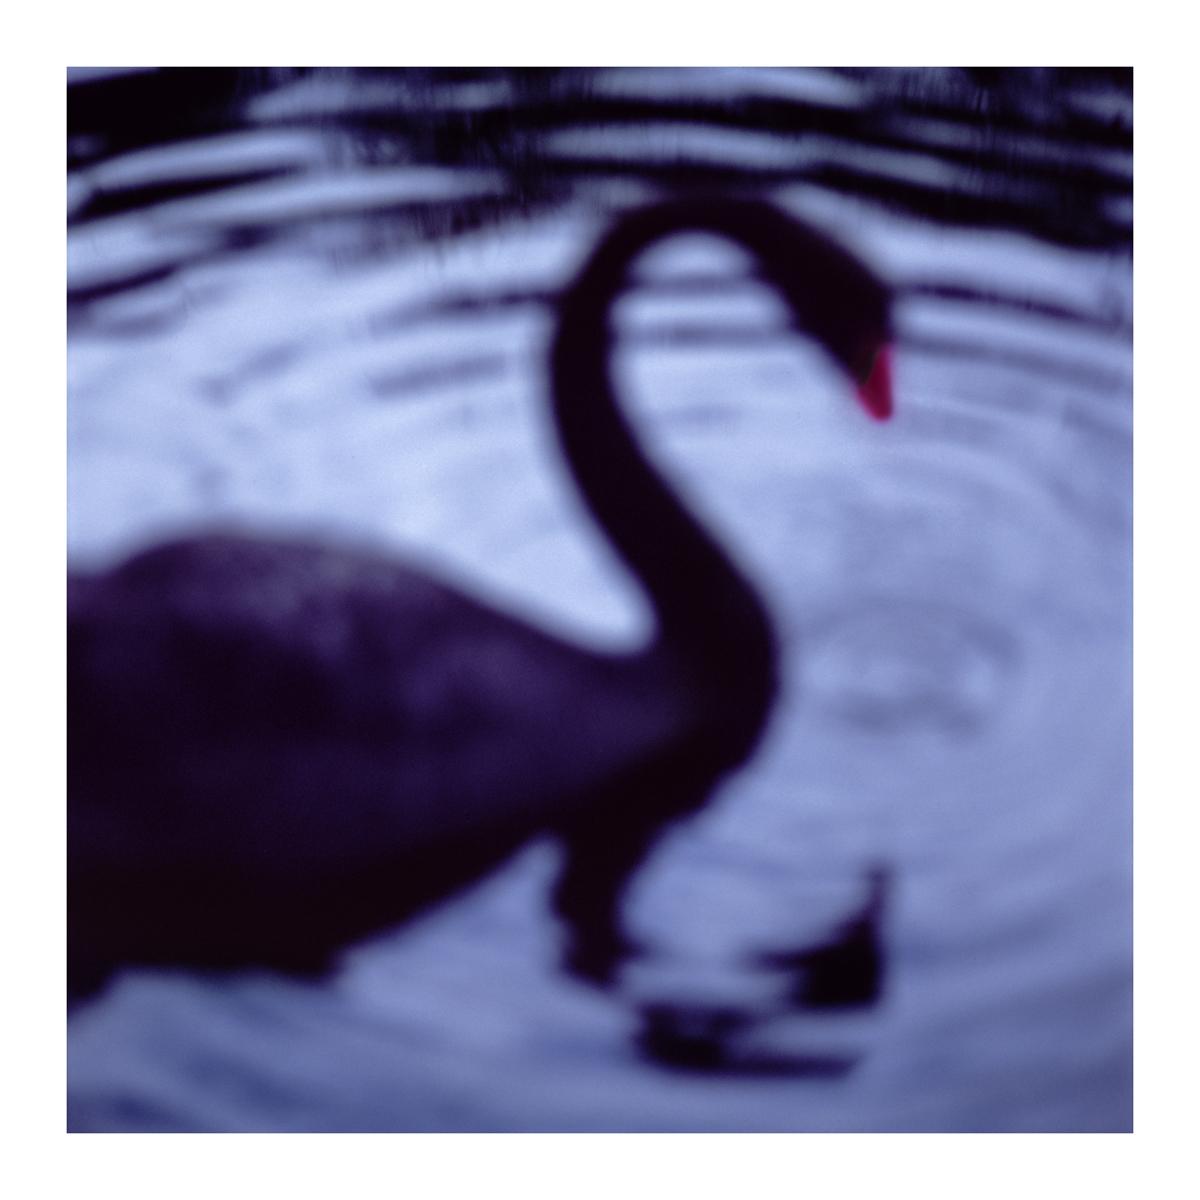 Black Swan, Centennial Park, Sydney, Australia, 2004